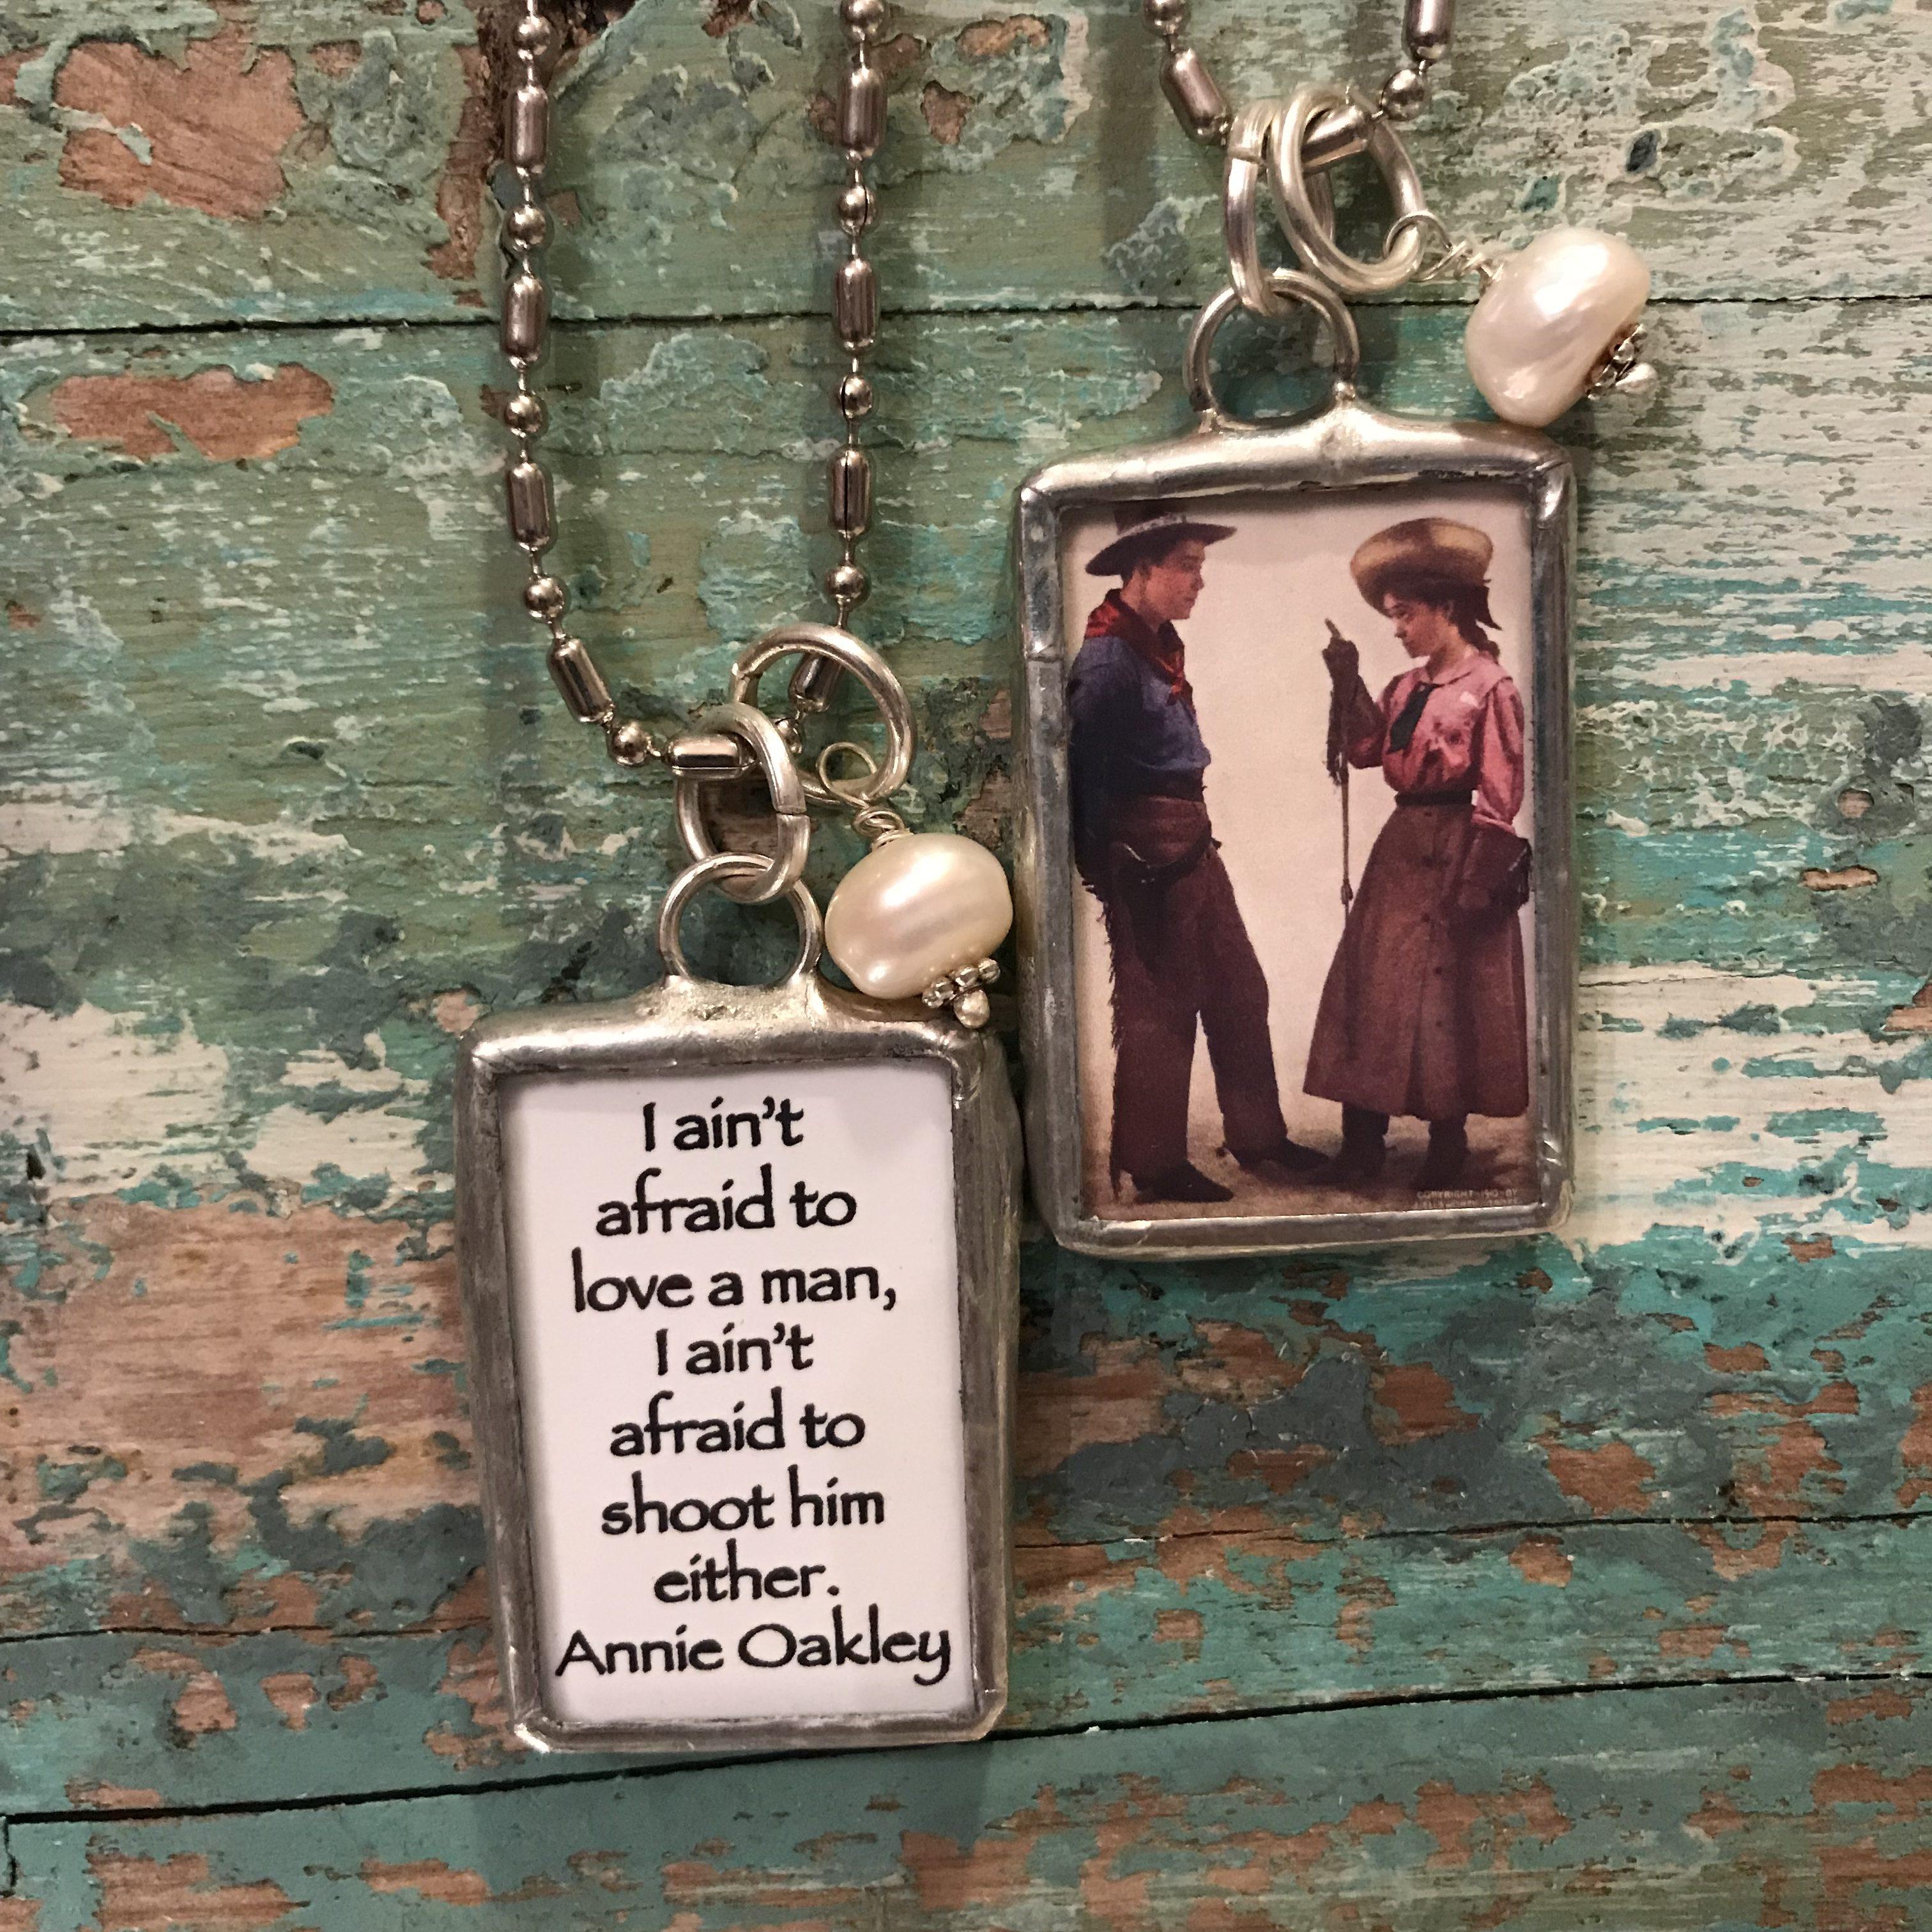 cowgirl, western, jewelry, Annie Oakley, funny, humor, handmade jewelry